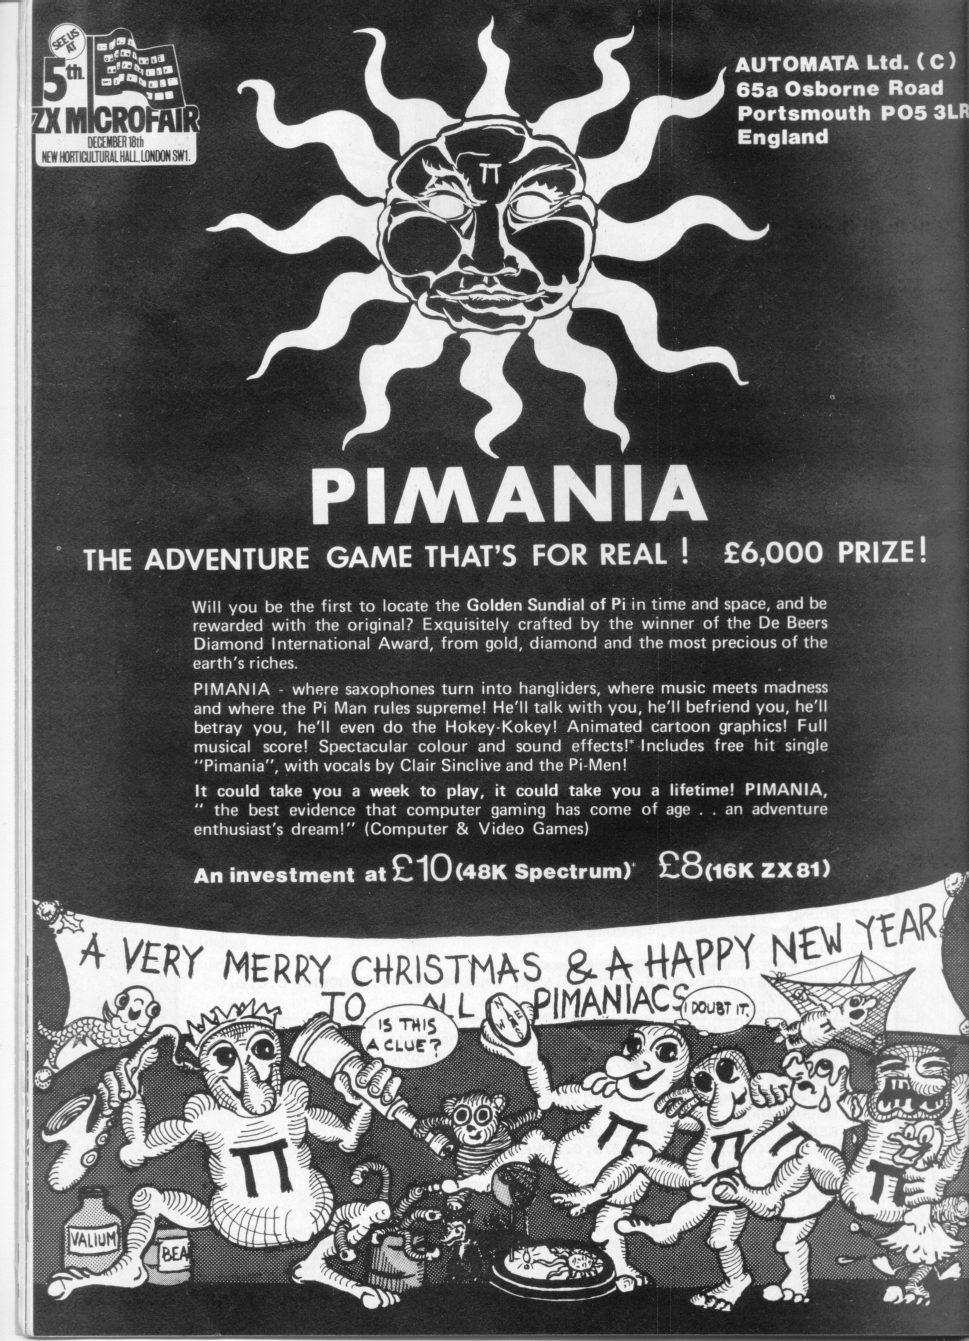 Mel Croucher Pimania - The Music Of Mel Croucher And Automata U.K. Ltd